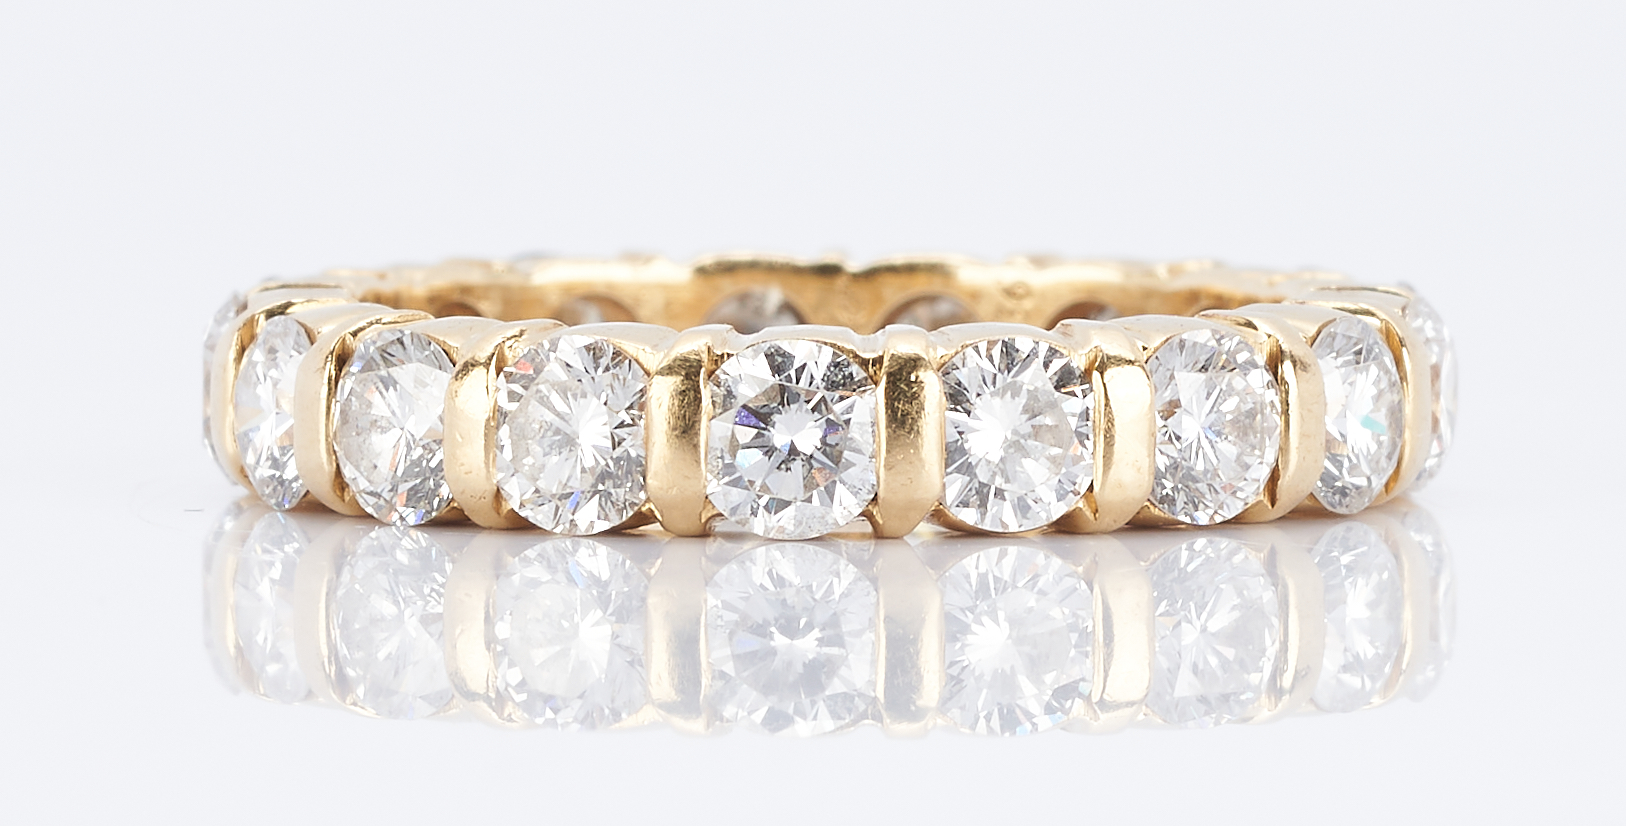 Lot 35: Ladies Cartier Diamond Eternity Ring